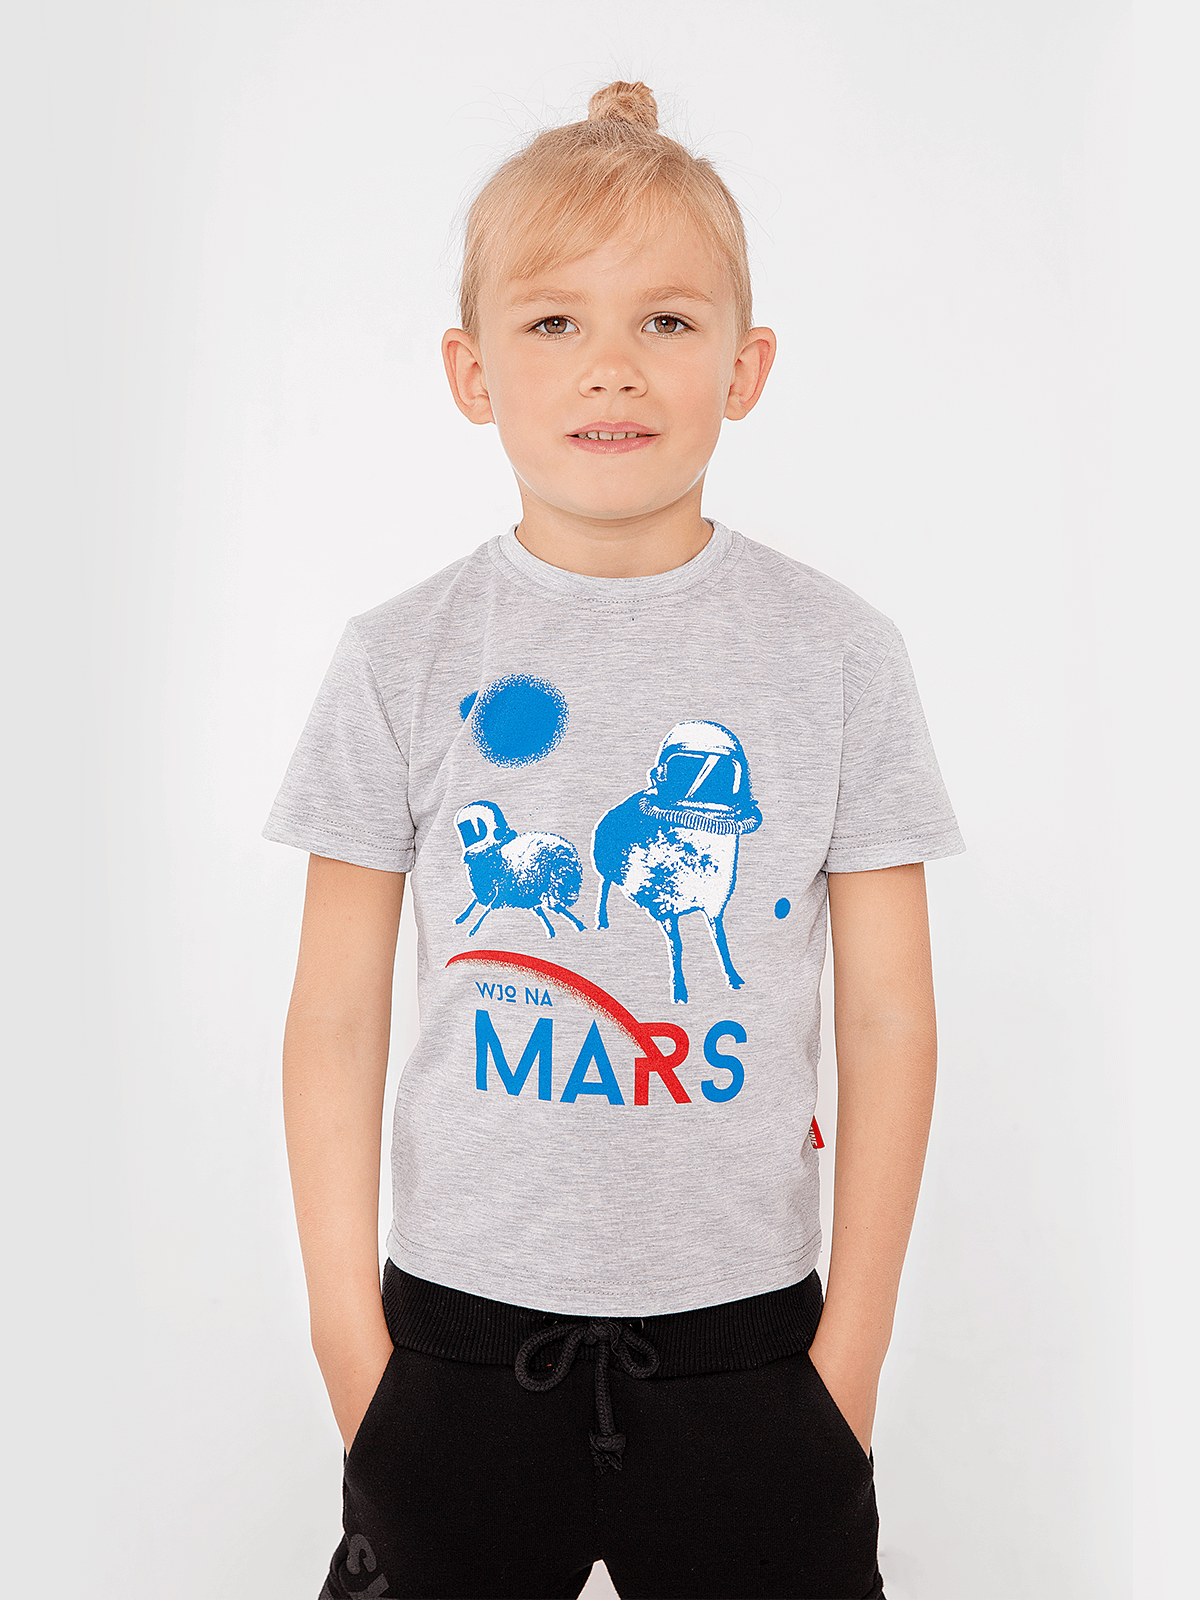 Kids T-Shirt Wjo Na Mars. Color gray. Material: 95% cotton, 5% spandex.